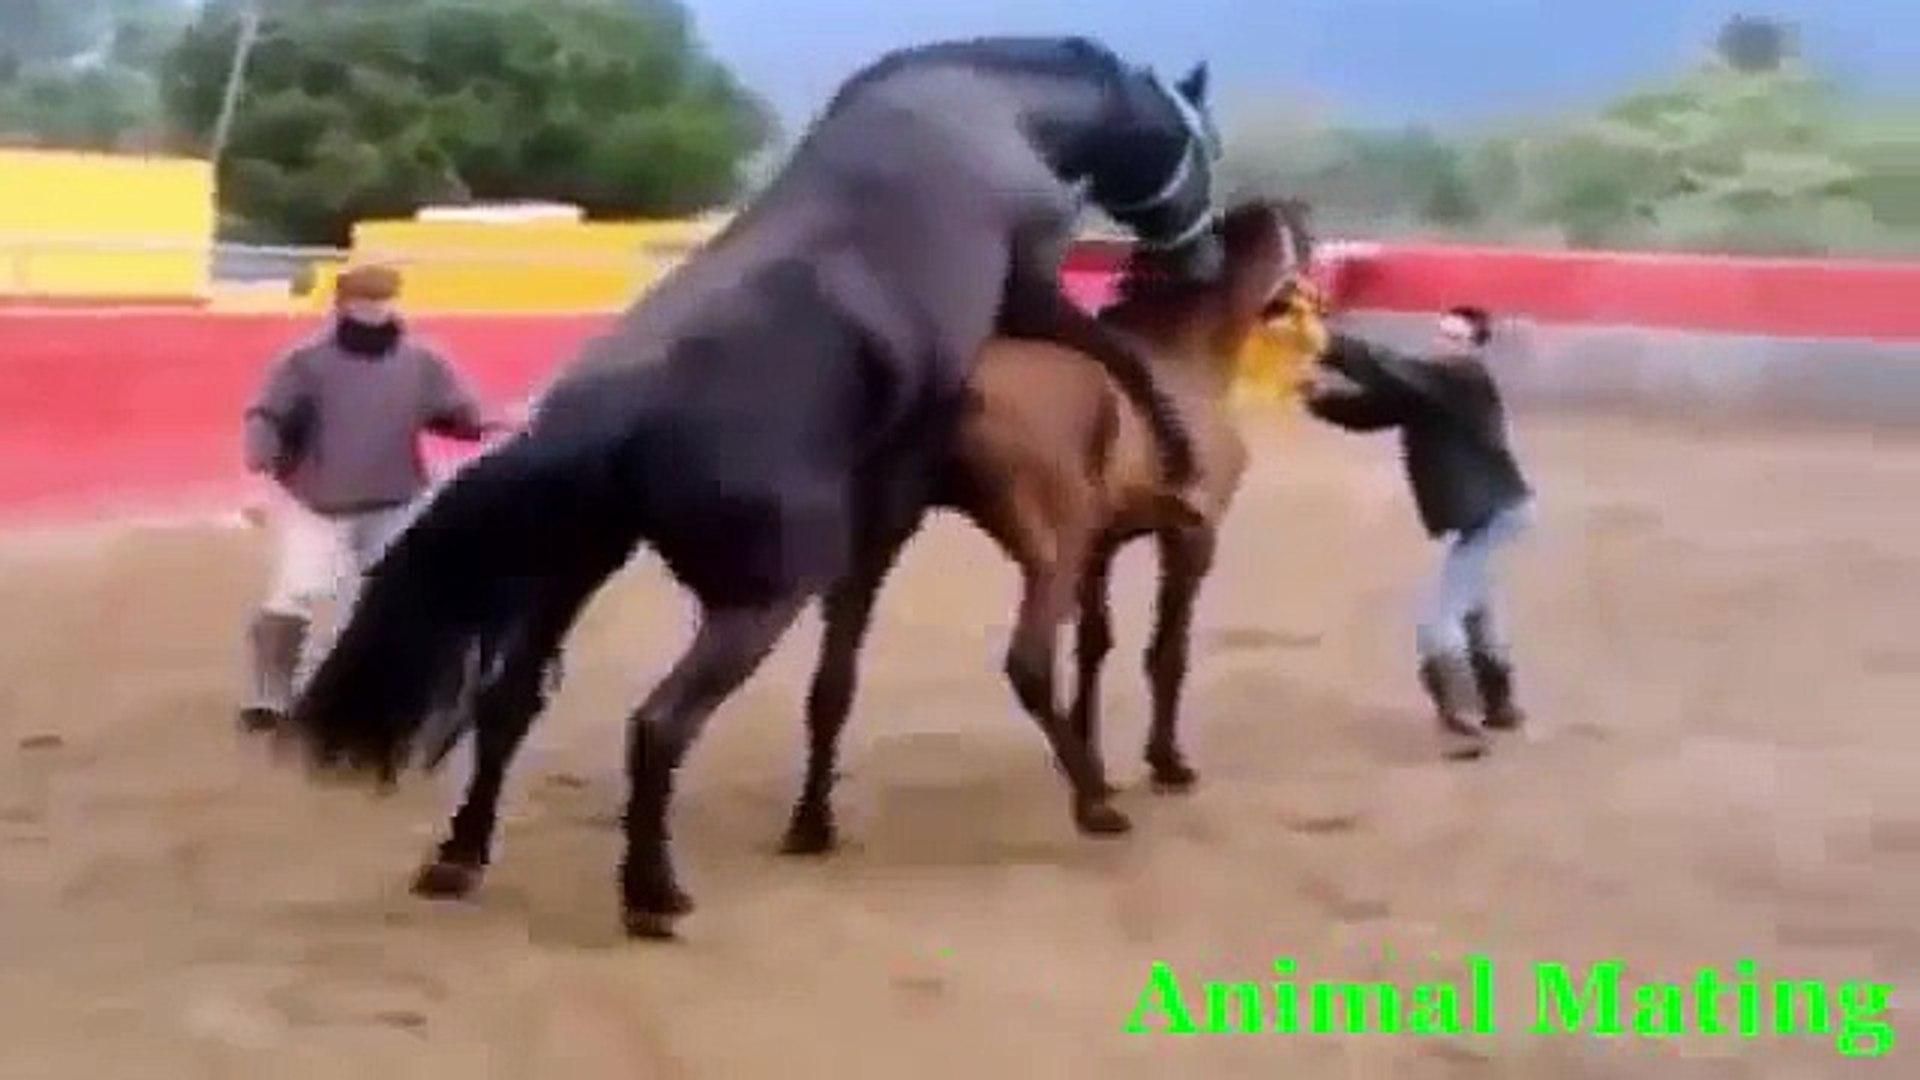 Funny videos   Animal matting 2015   Funny fail videos 2015, Funny animal videos 2015 part1